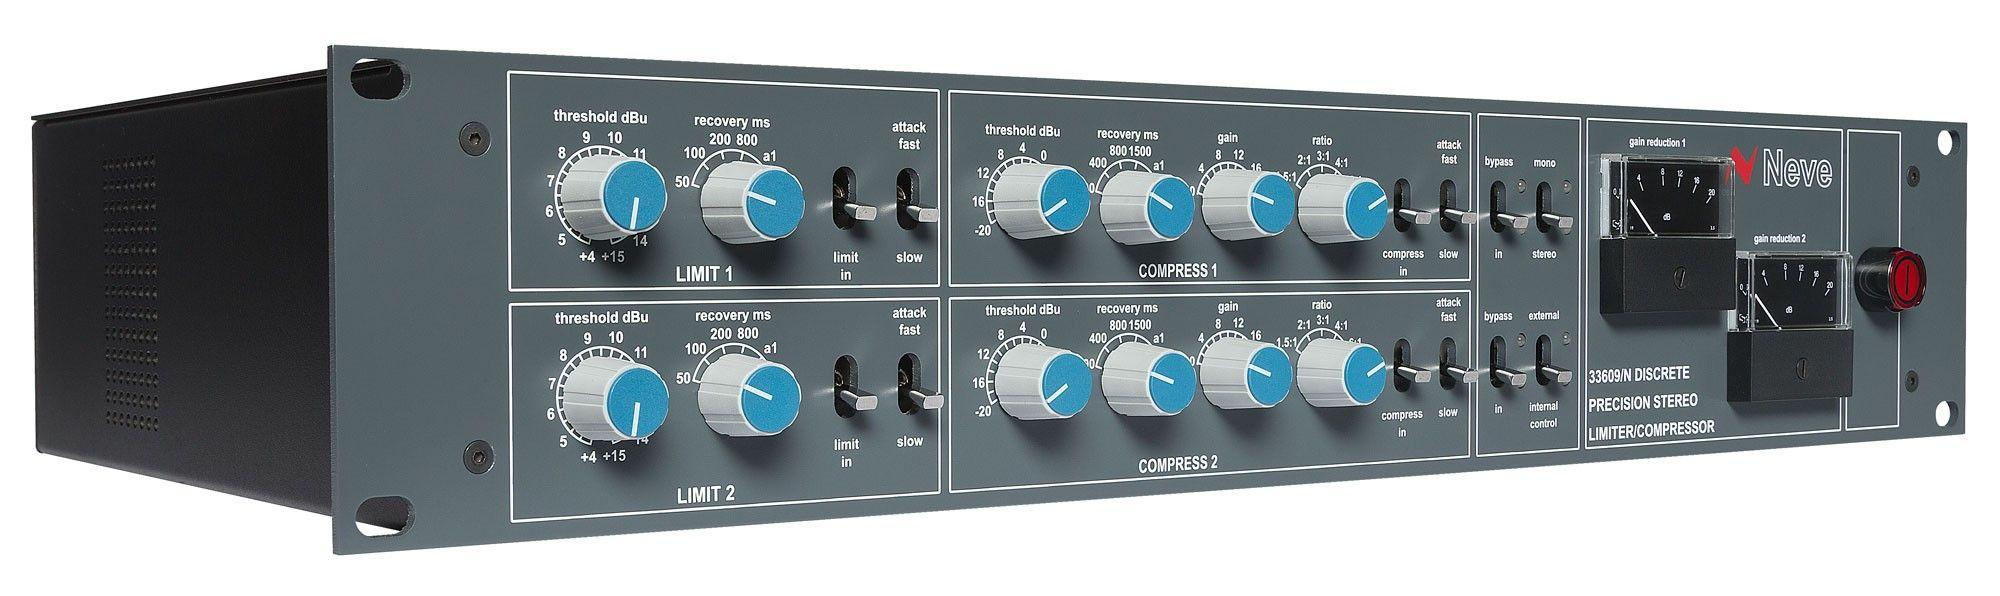 AMS Neve 33609 N Discrete Dual / stereo compressor limiter - The Neve 33609  Stereo Compressor offers comprehen… | Stereo, Digital dj, Loudspeaker  management systems